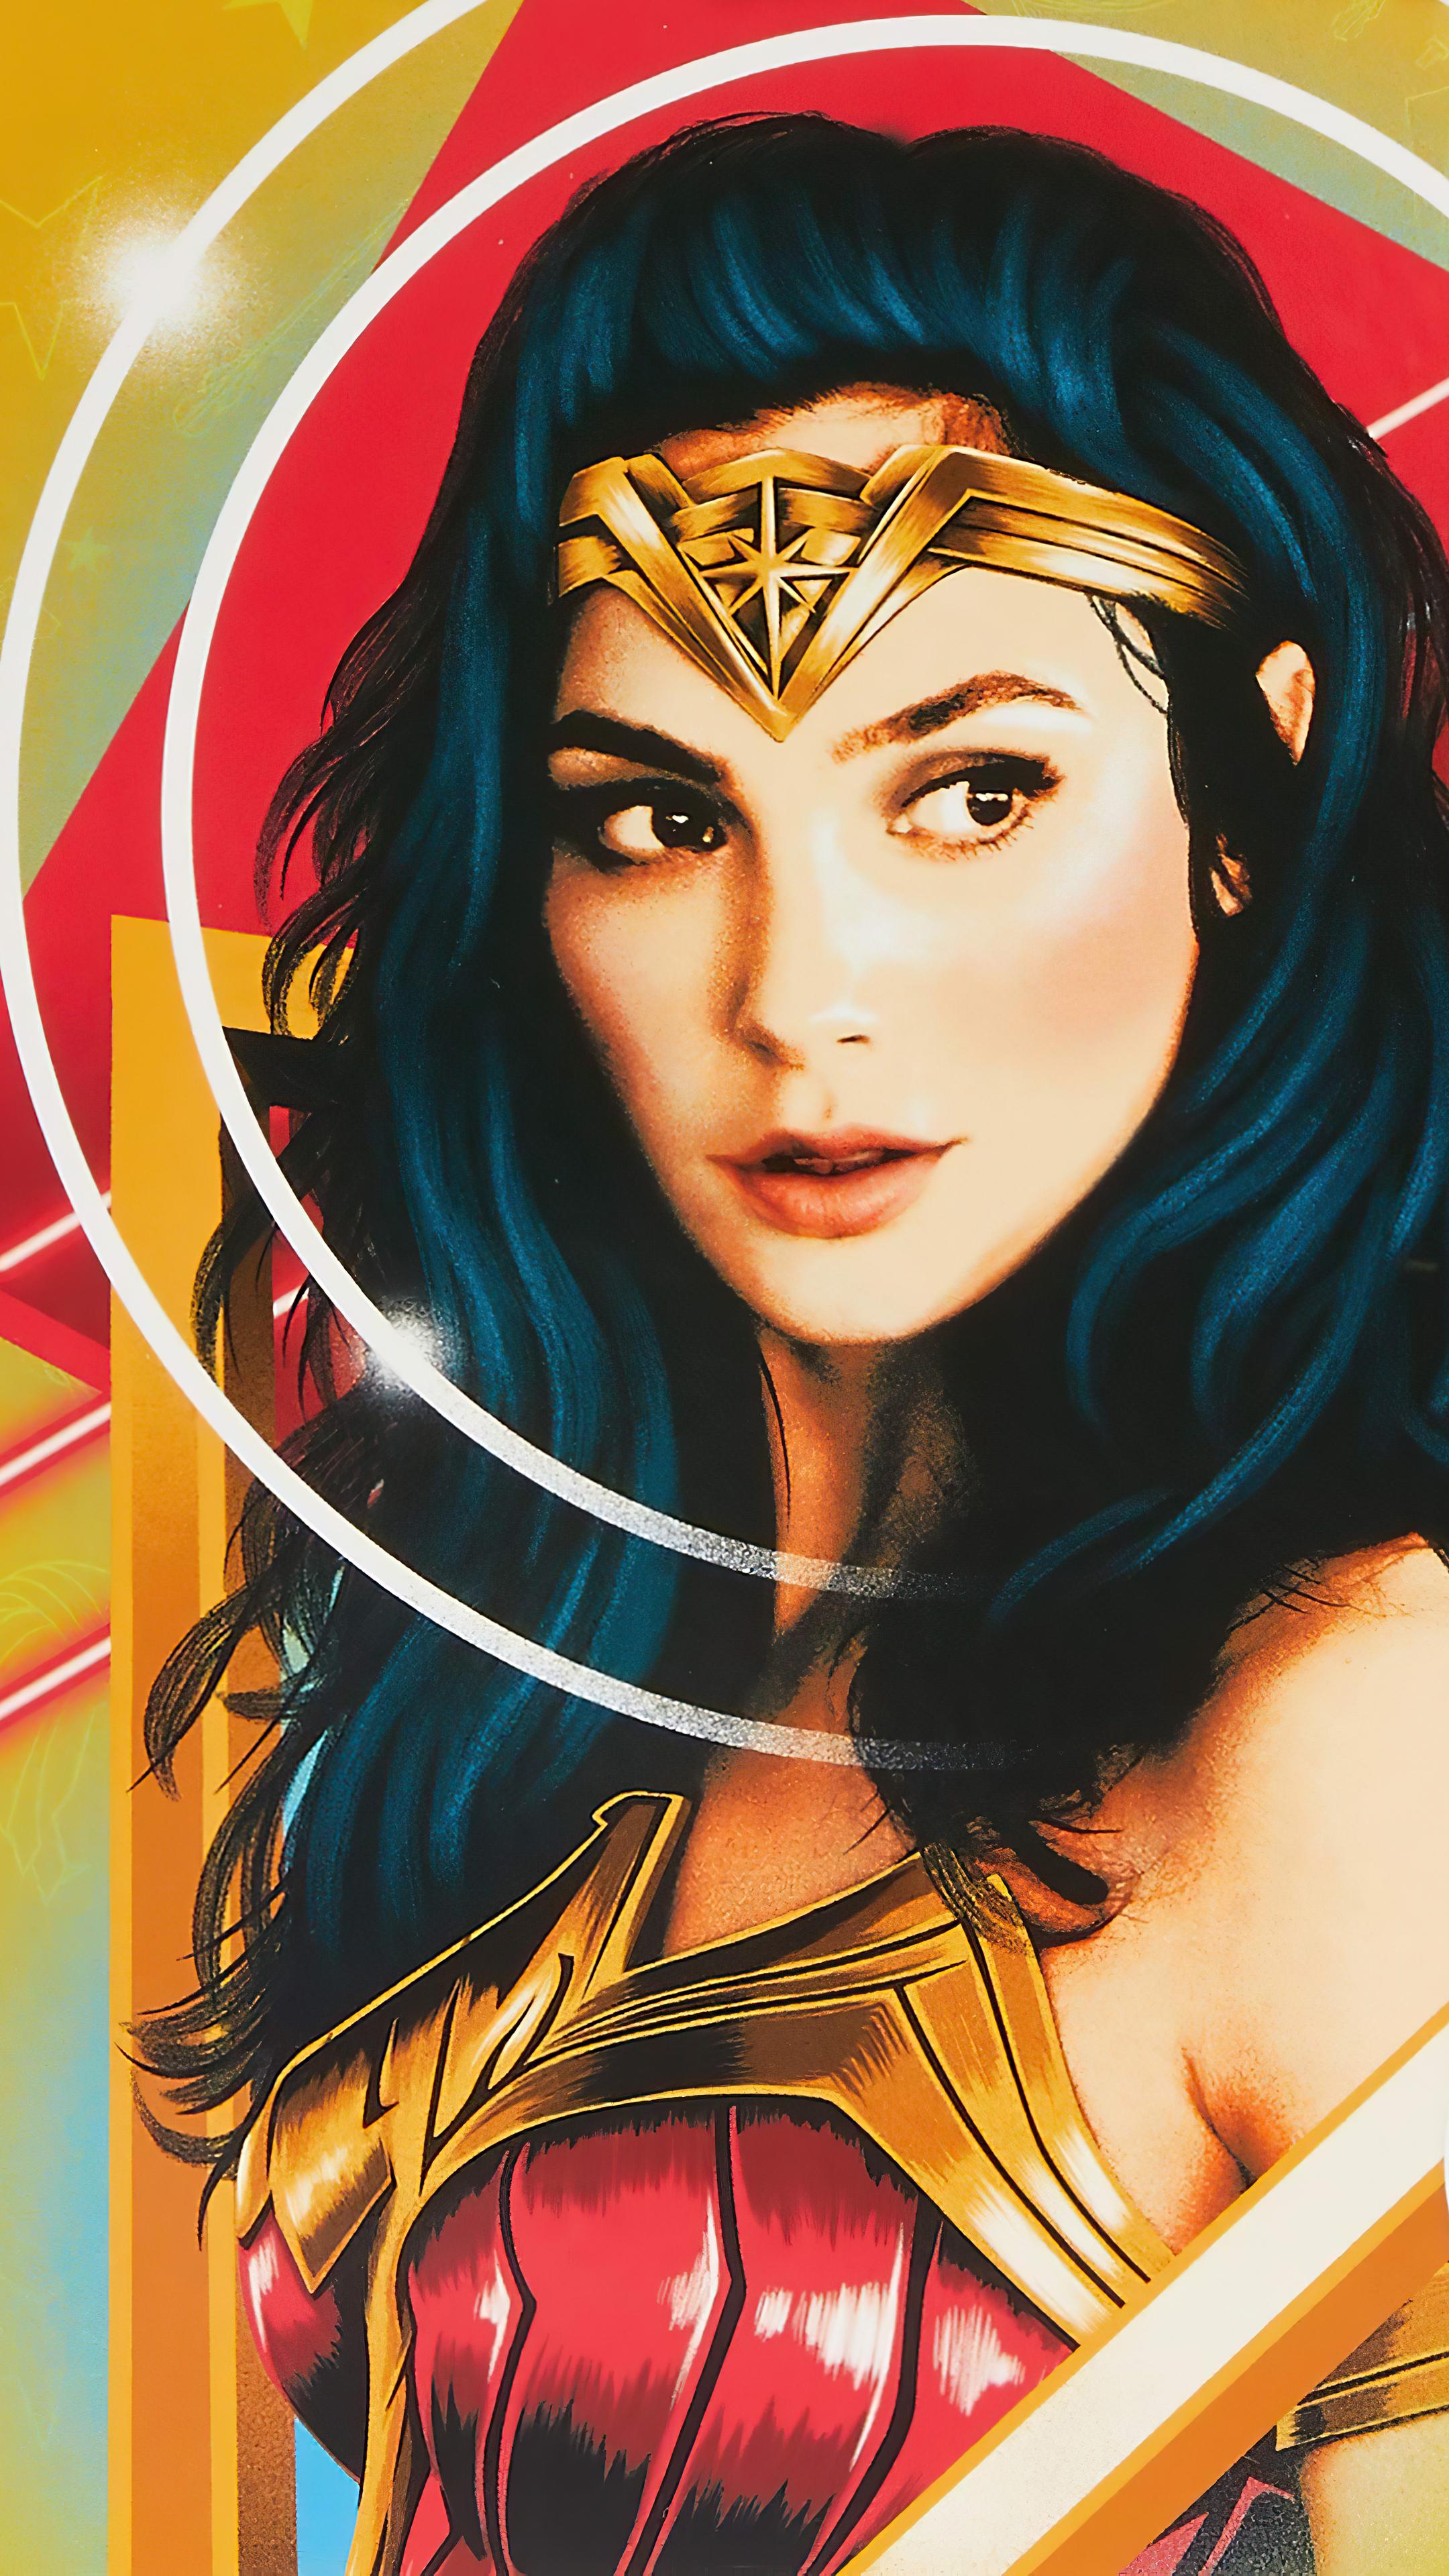 2160x3840 Wonder Woman 1984 New Poster Art Sony Xperia X ...